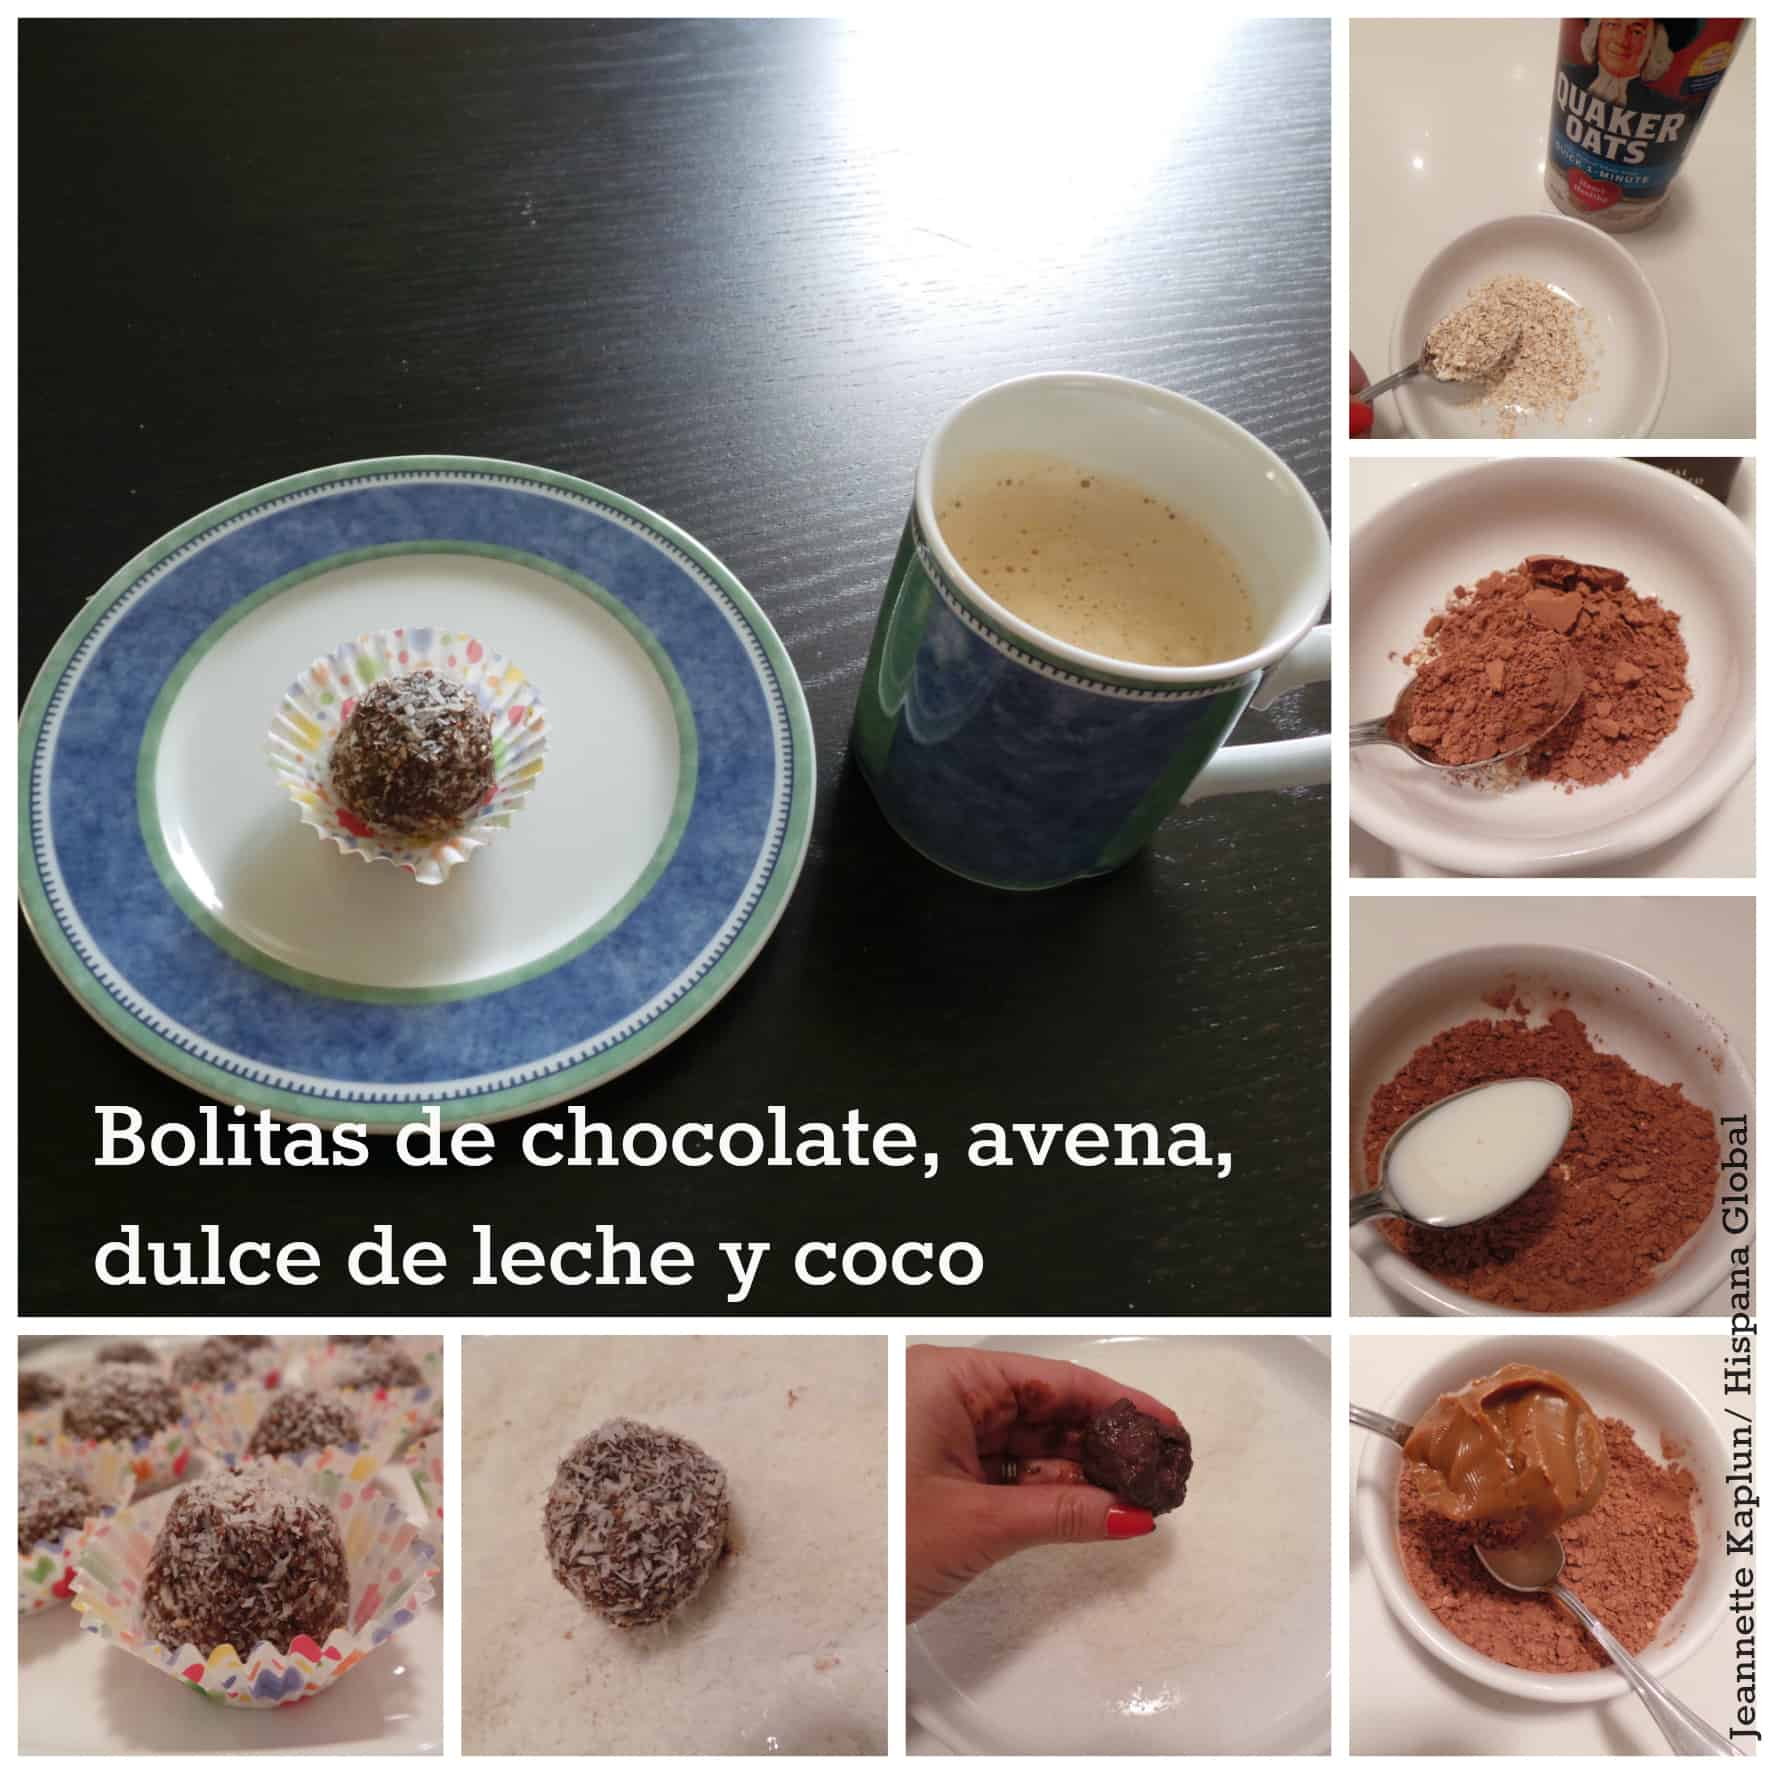 Haz bolitas sw chocolate avena dulce de leche y coco